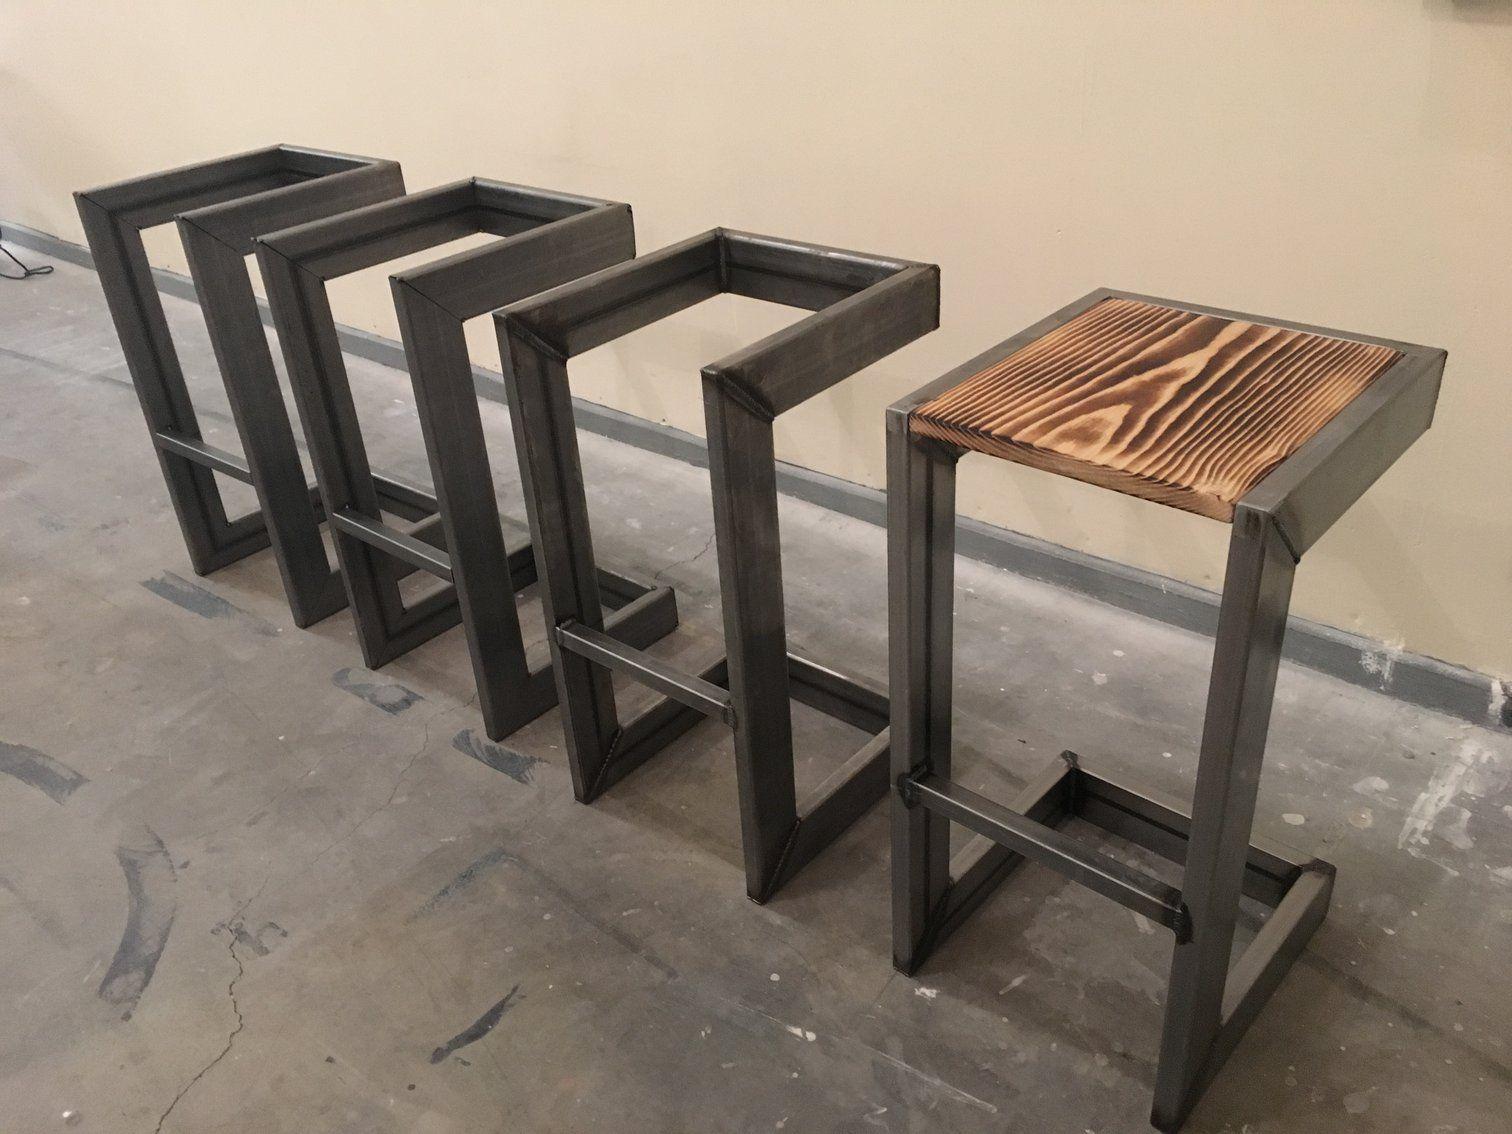 Handmade Modern Industrial Bar Stool Industrial Bar Stools Industrial Design Furniture Welded Furniture